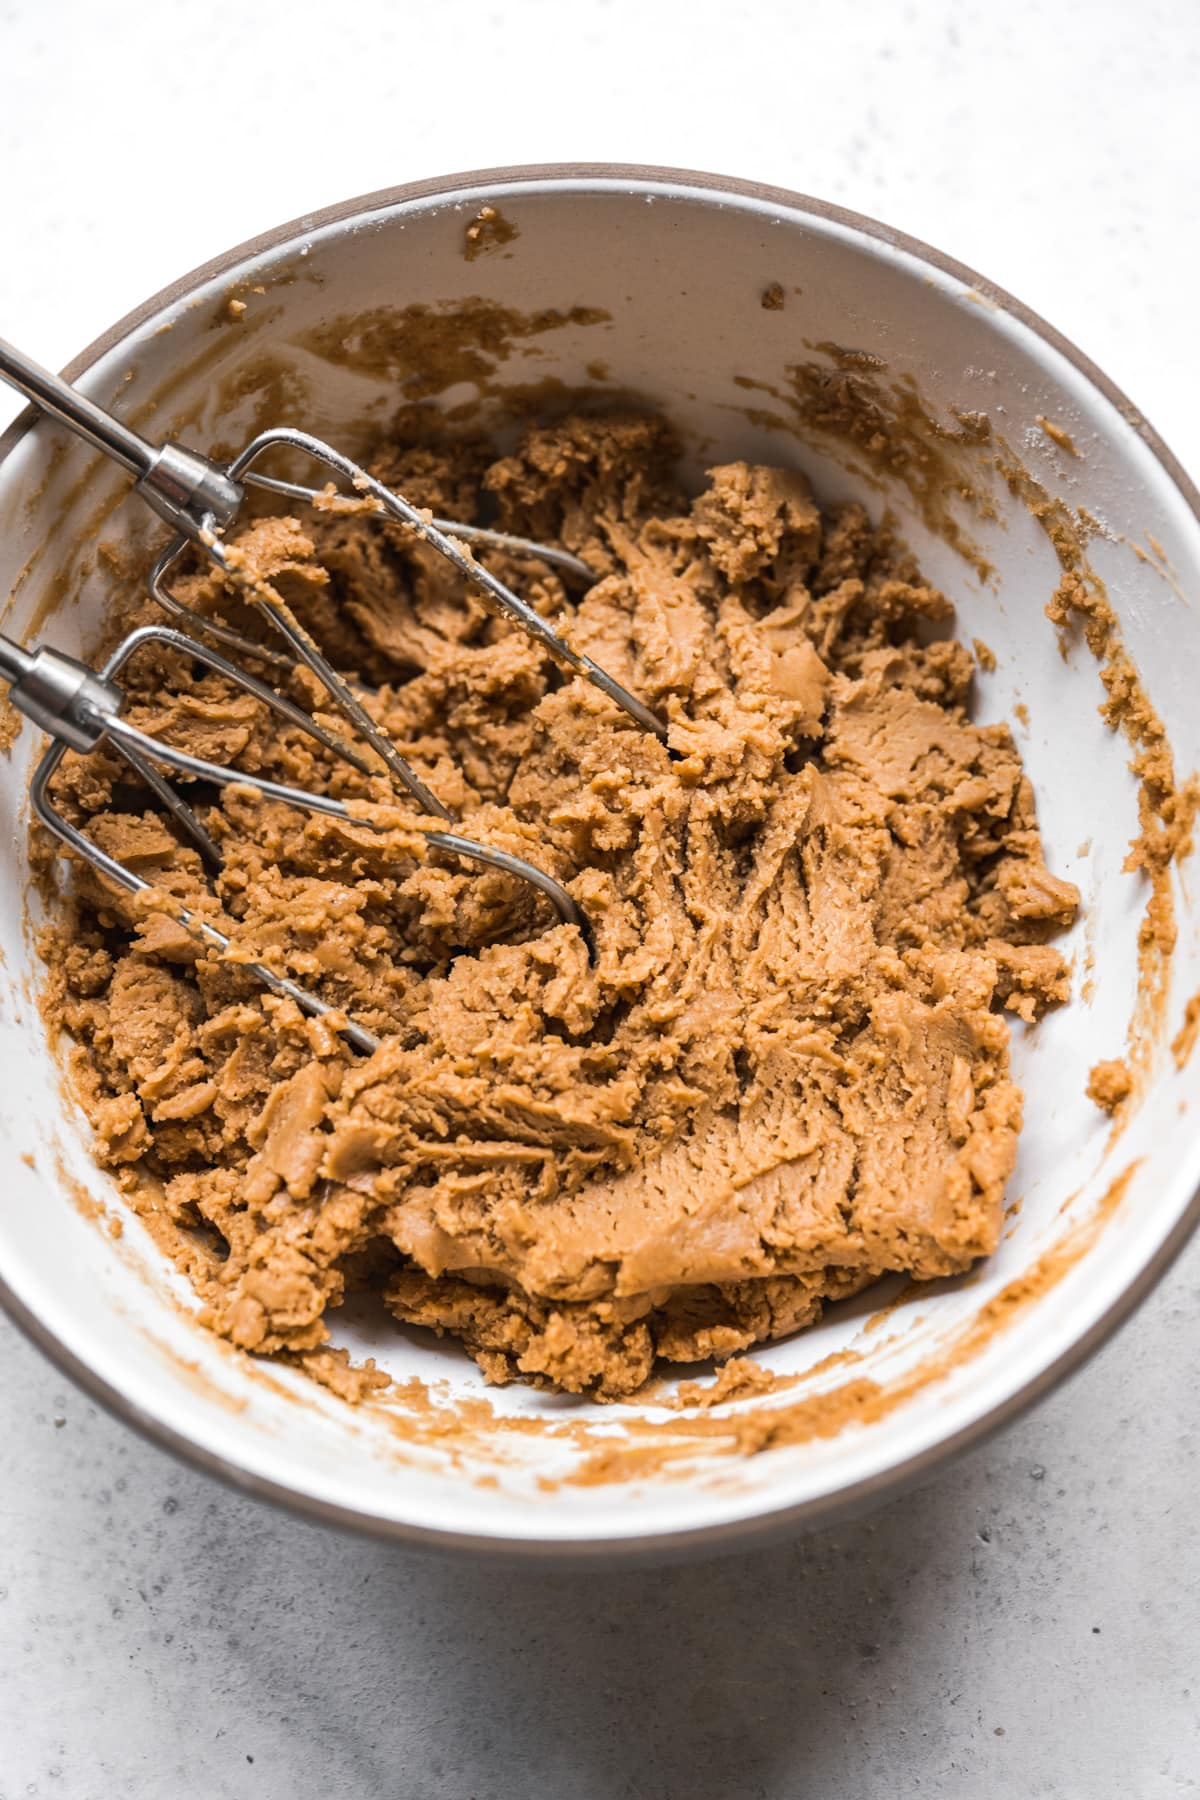 vegan buckeye dough in mixing bowl.